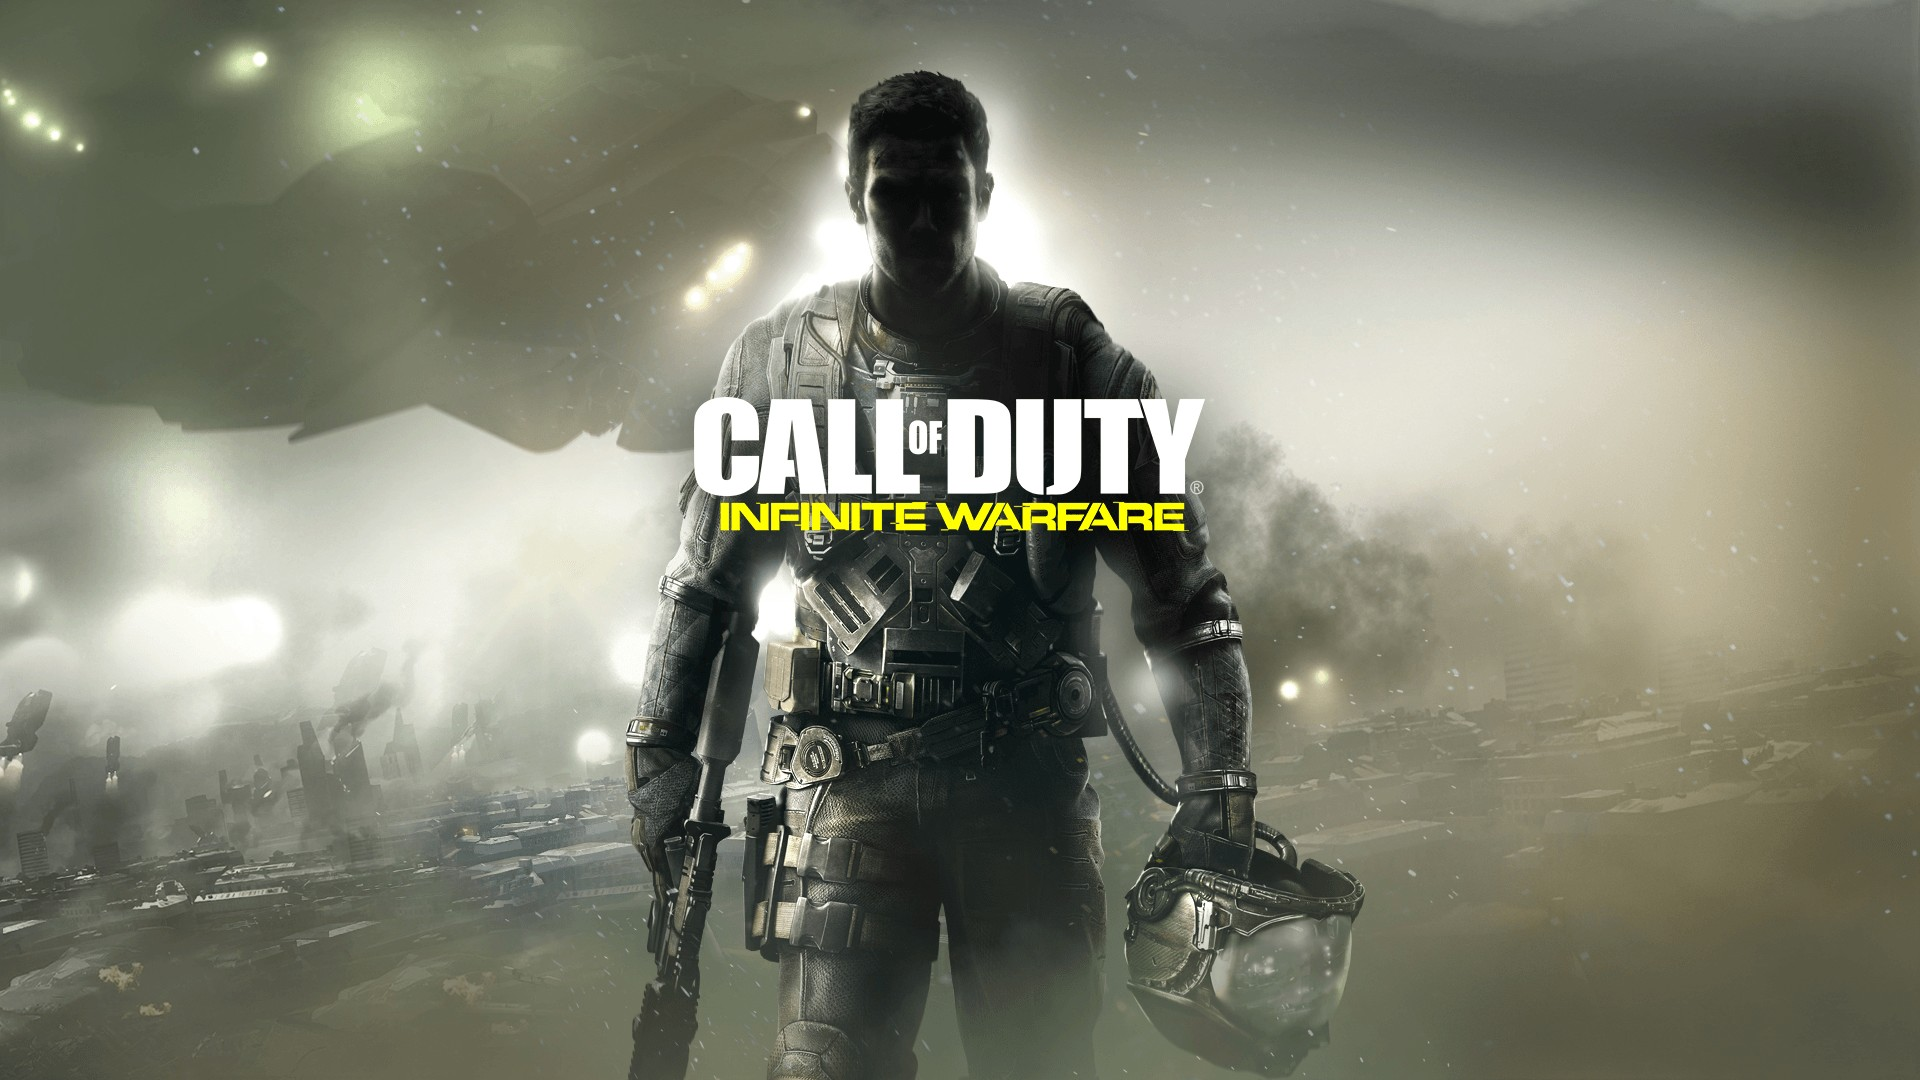 test de call of duty infinite warfare sur PS4